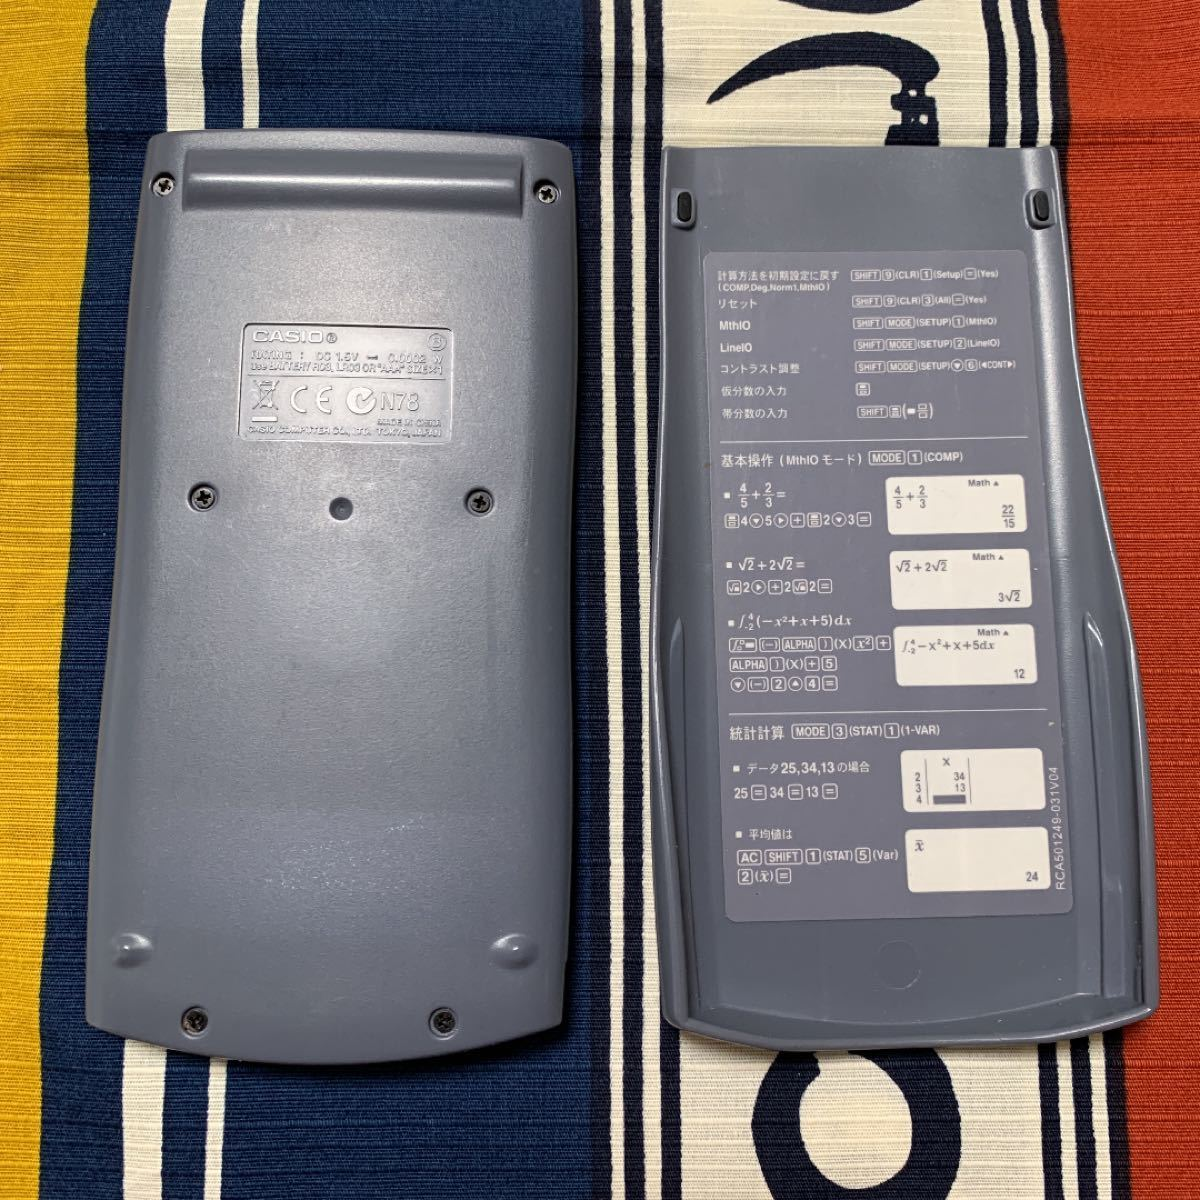 【美品】関数電卓 CASIO fx-370ES (自然表示) カシオ関数電卓